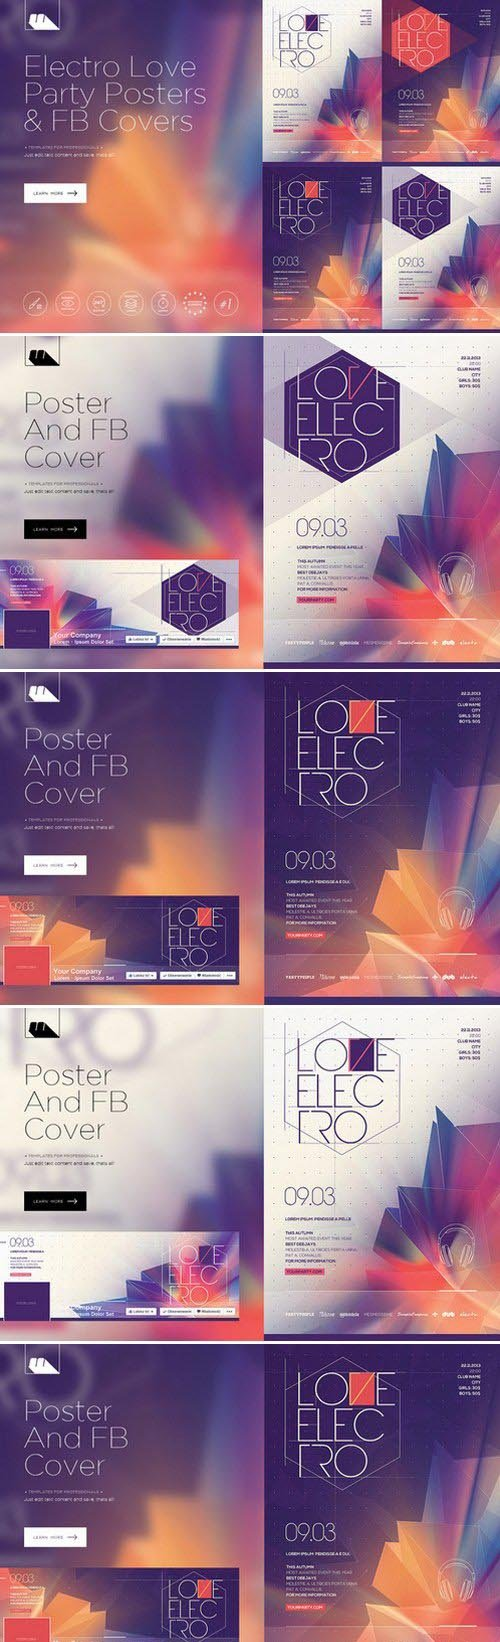 CM - Electro Love 4 Posters